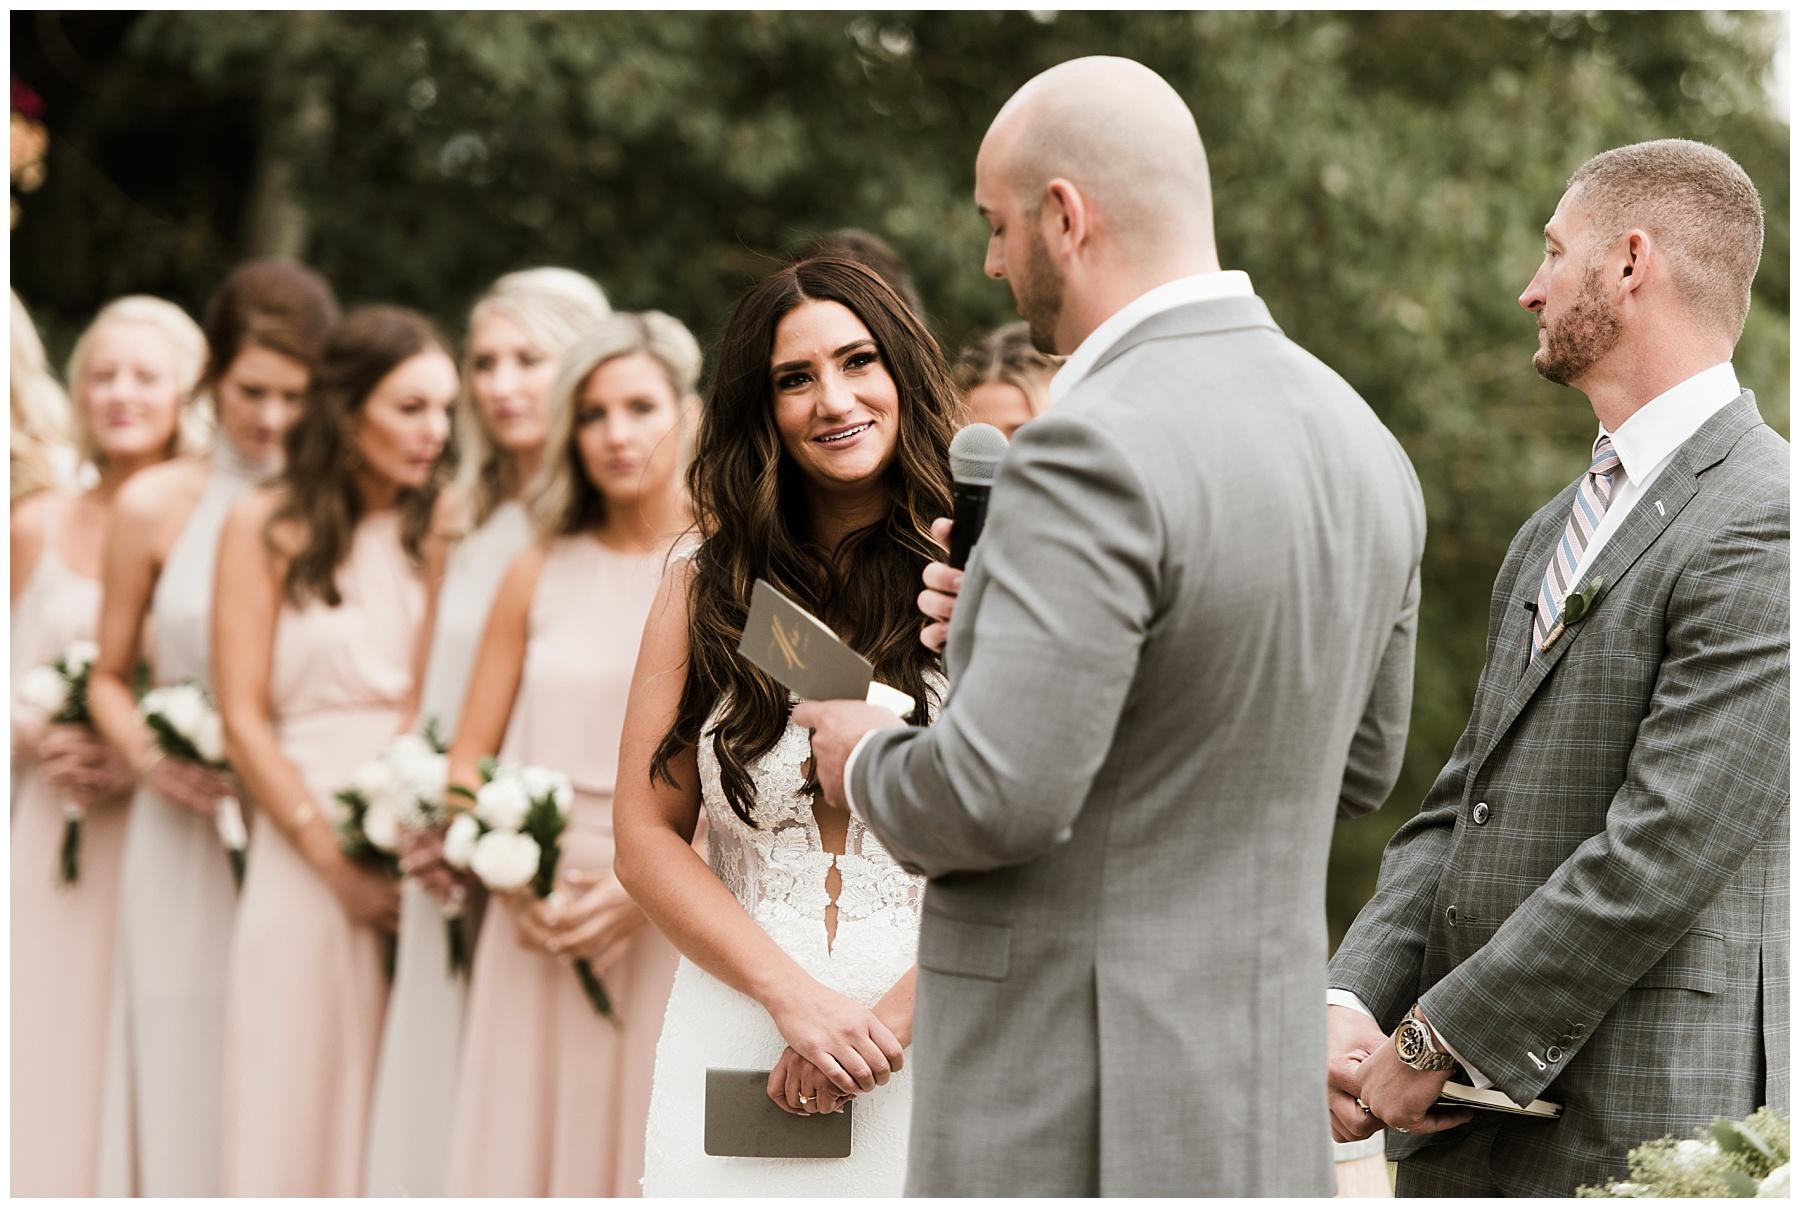 Katesalleyphotography-400_married in Breckenridge.jpg